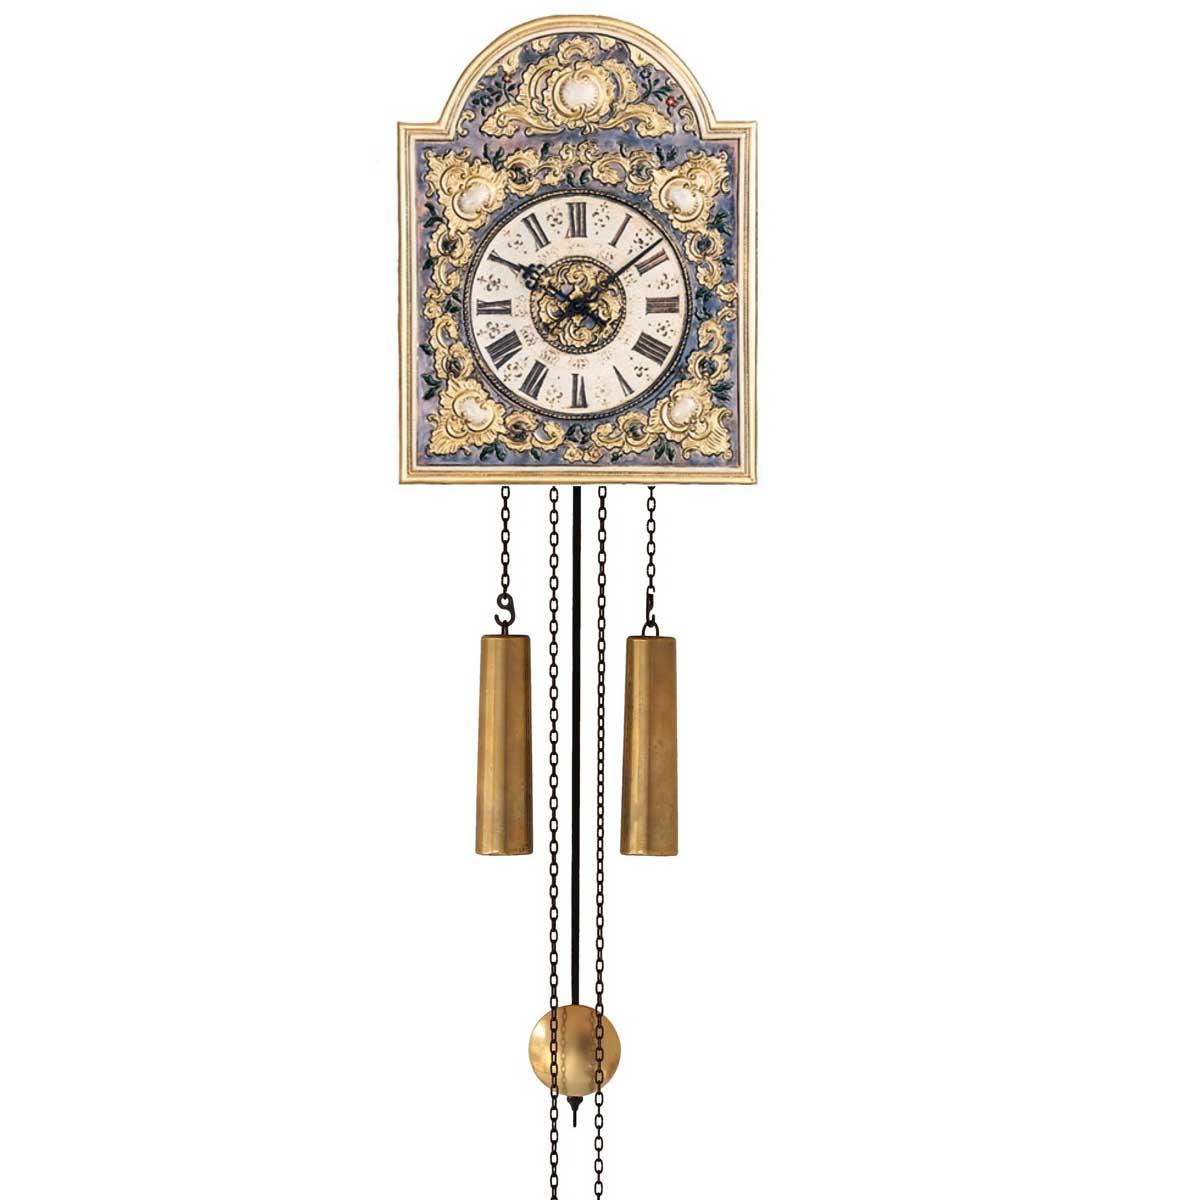 WU59 Traditional Wall Clock